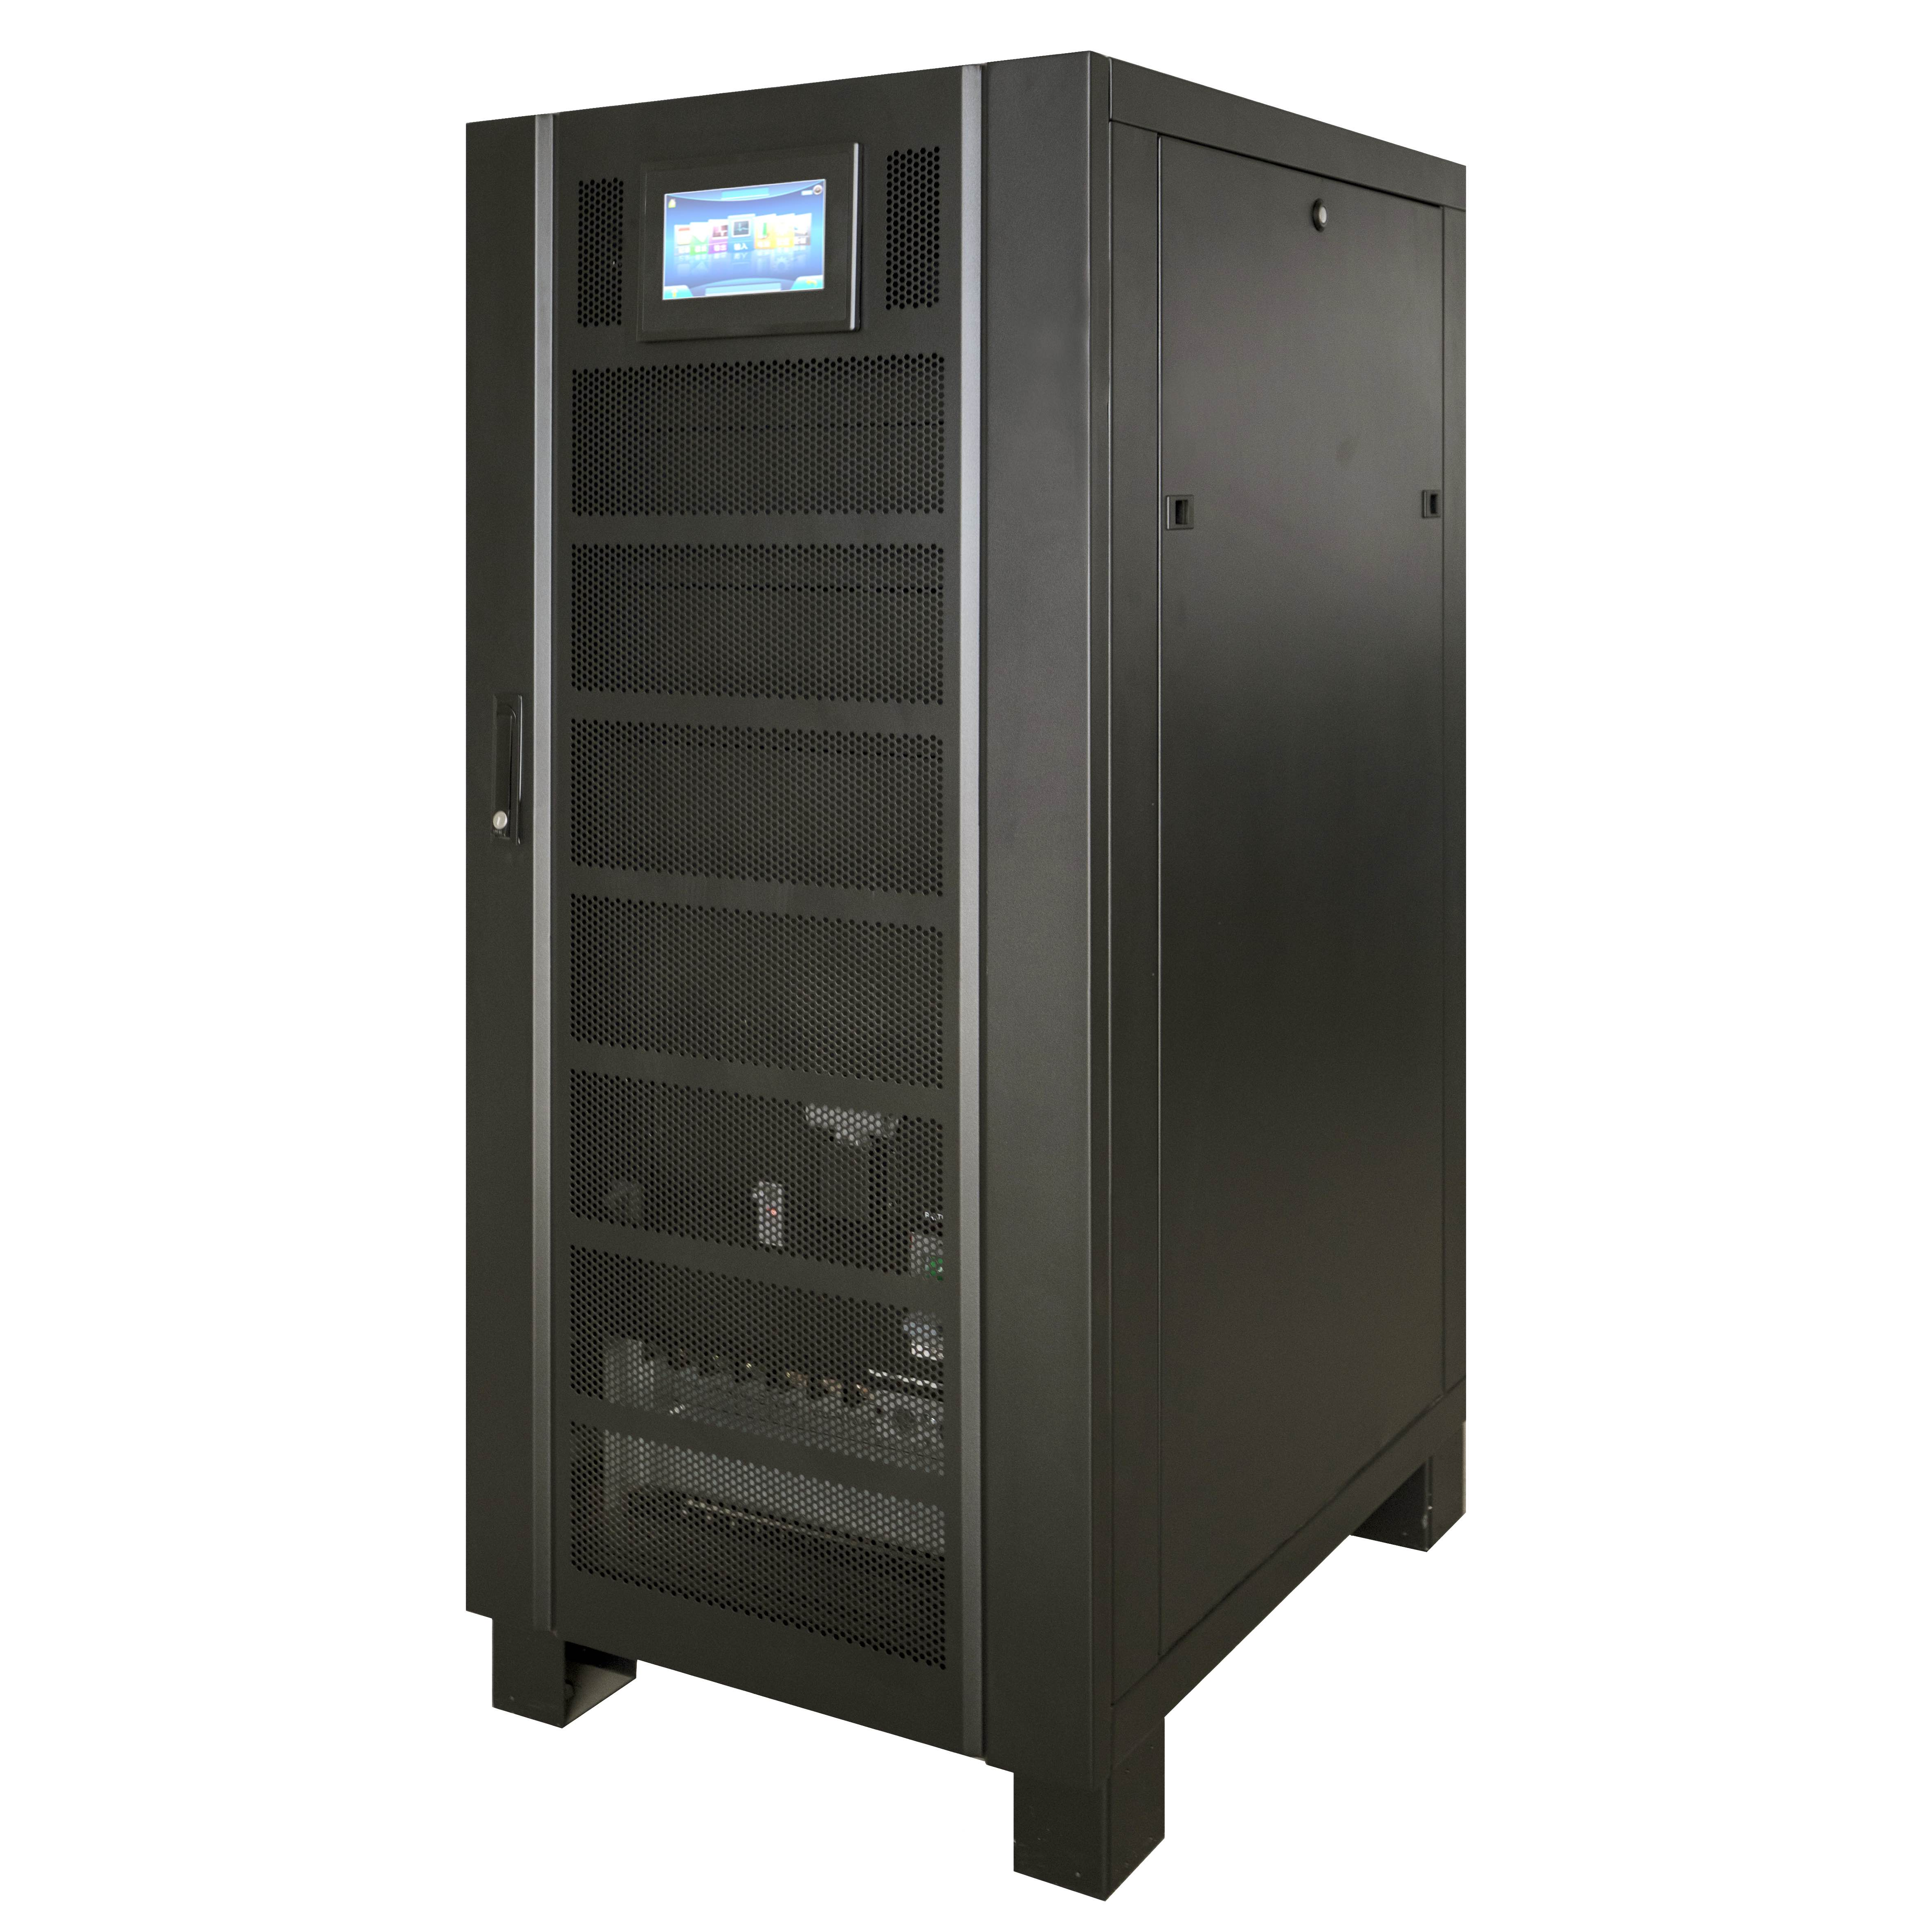 MT Series 3 Phase Modular Online UPS 30-150KVA (3/3 Phase)